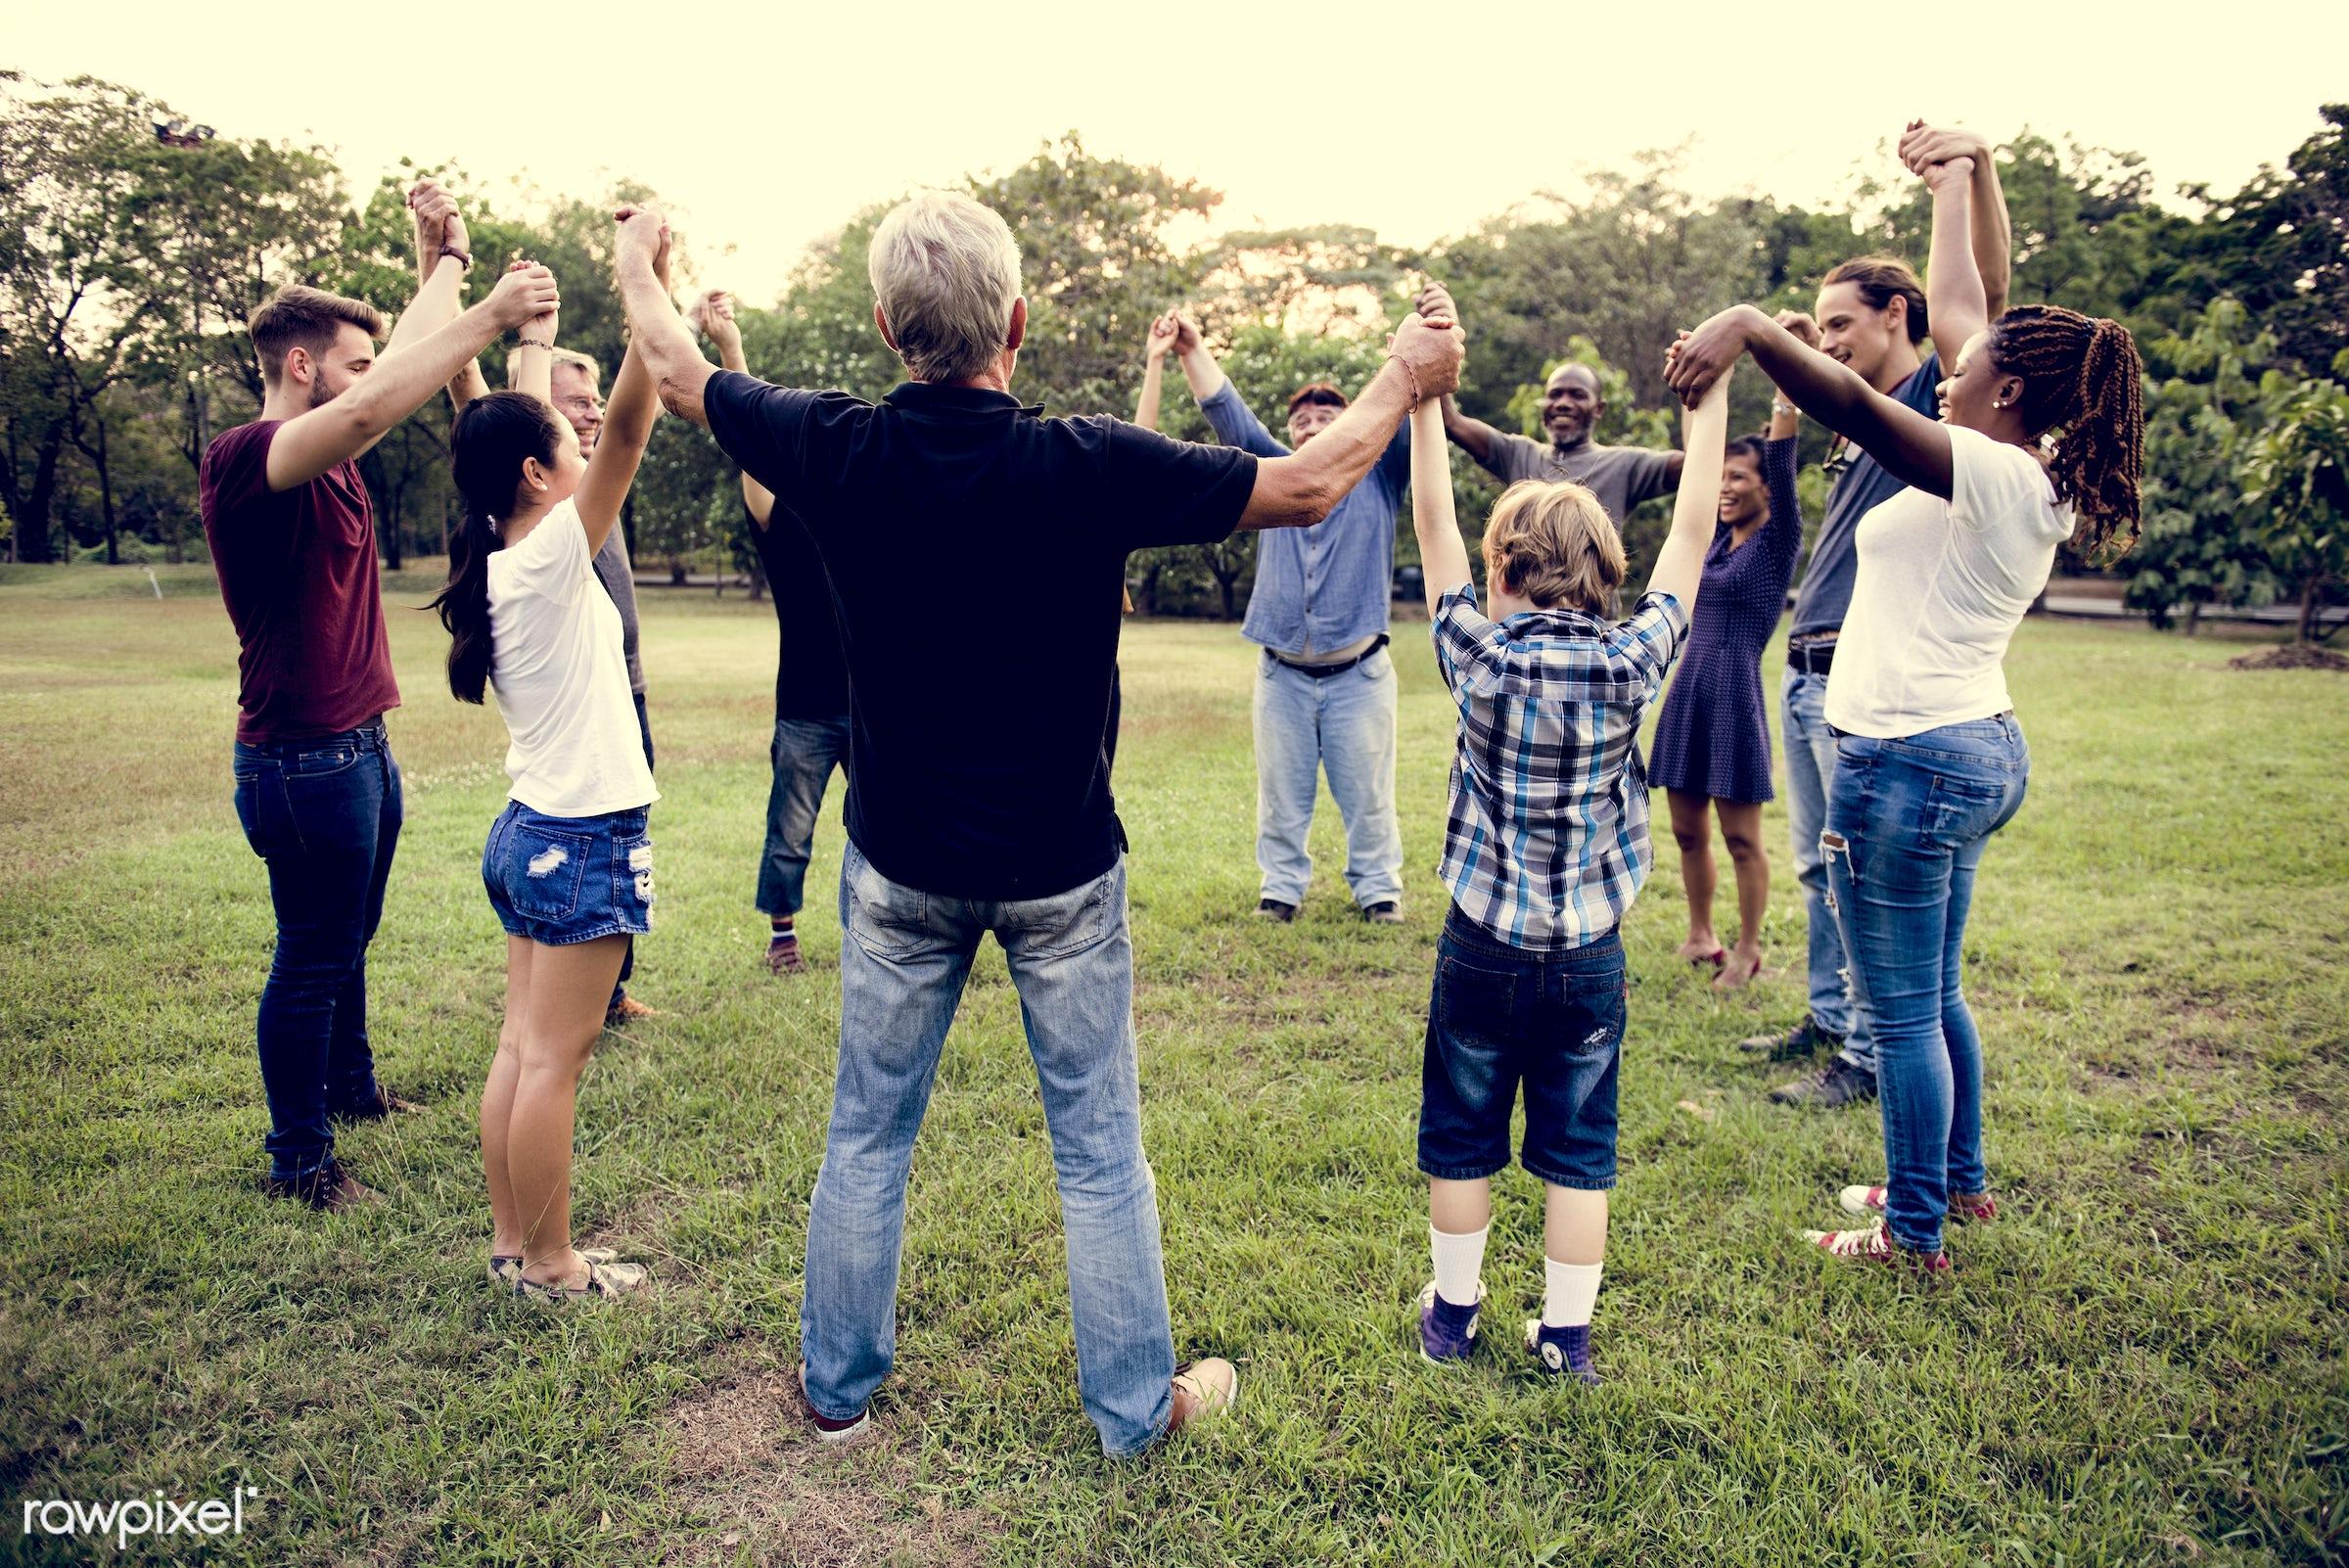 countryside, diverse, bonding, neighbor, people, positivity, kid, friends, tree, nature, woman, lifestyle, friendship,...